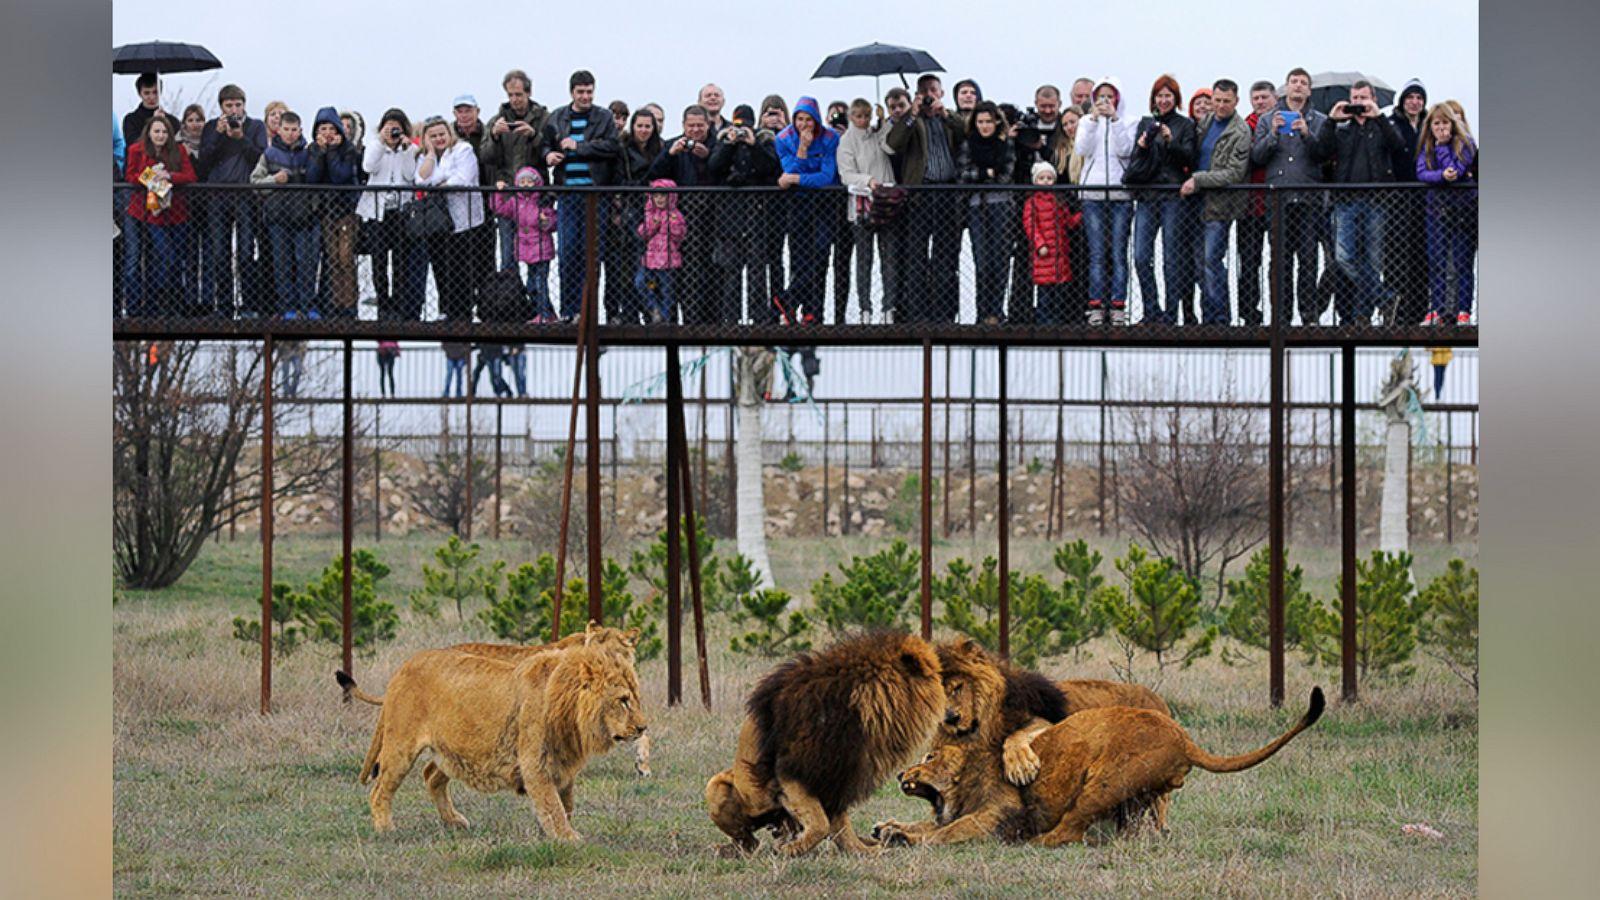 e5510b4a Fifty Lions Face Starvation at Crimean Safari Park - ABC News